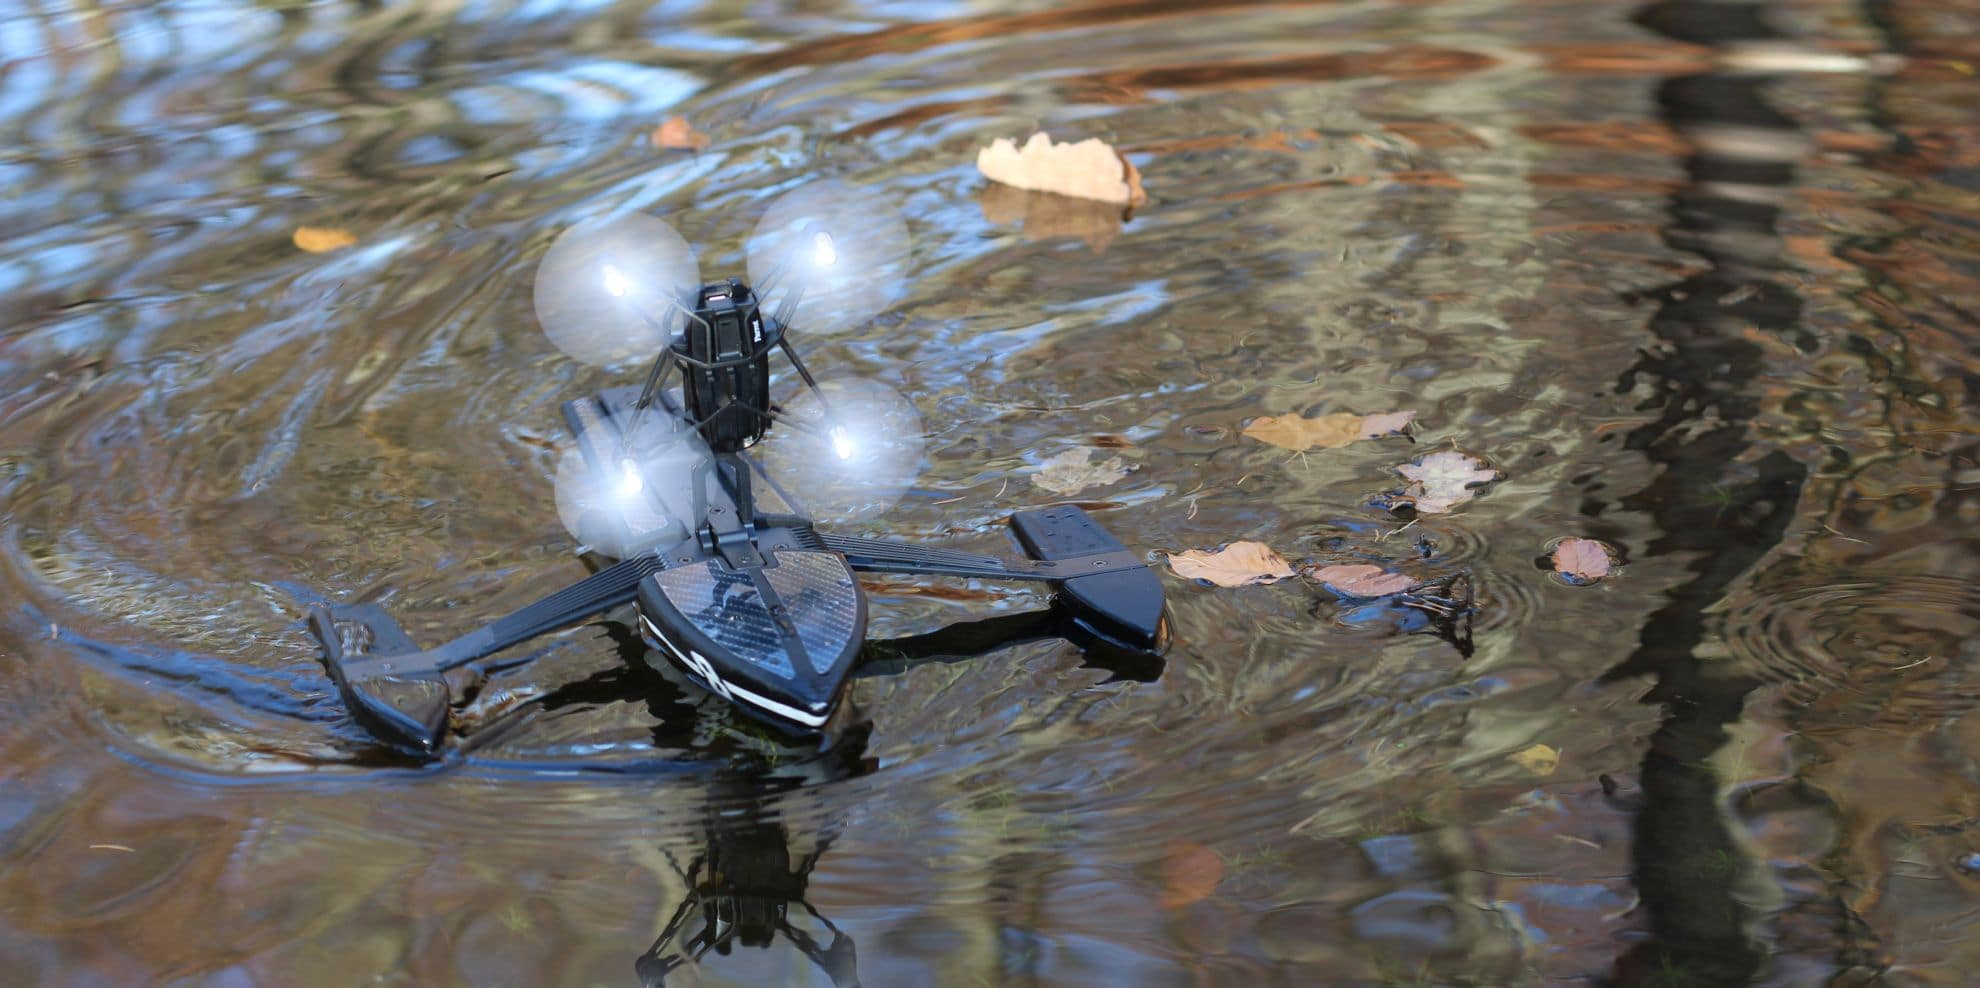 Action auf dem Wasser. (Foto: GamingGadgets.de)